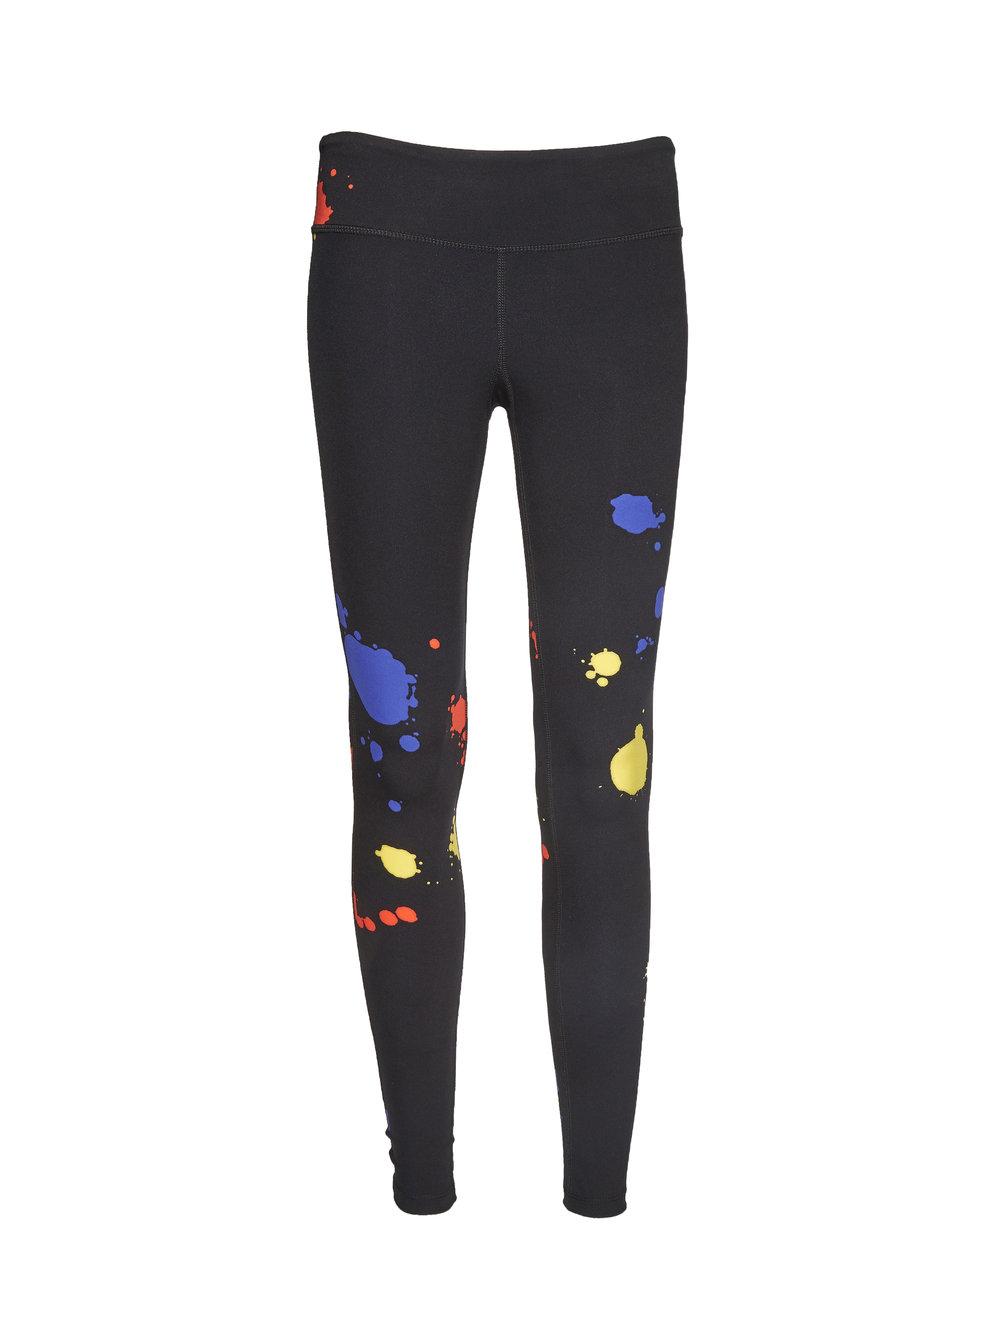 paint splatter yoga pants